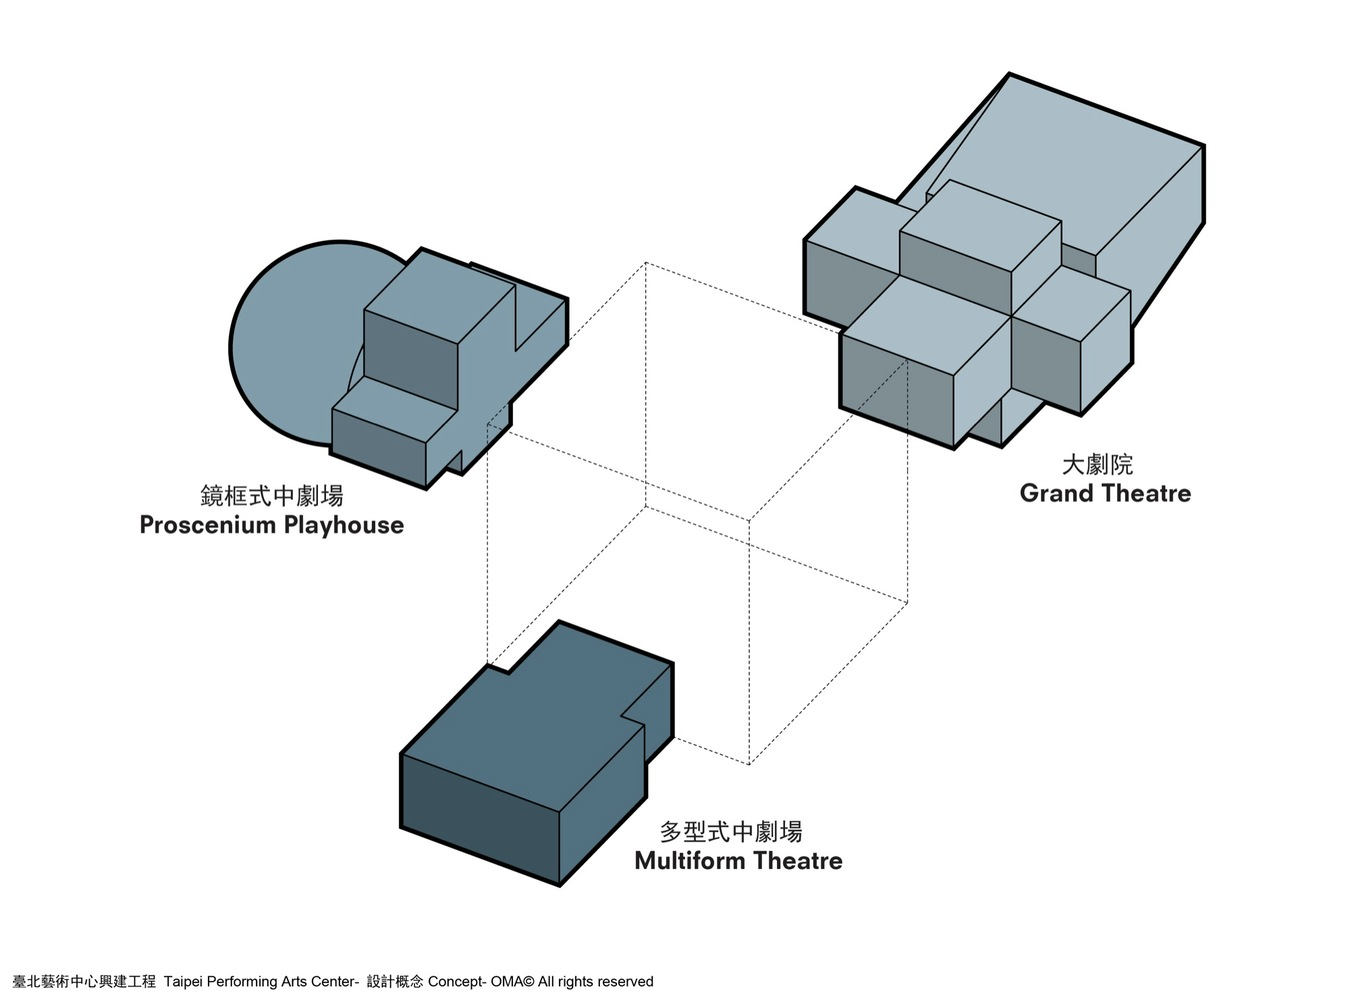 klh surround sound wiring diagram. Black Bedroom Furniture Sets. Home Design Ideas